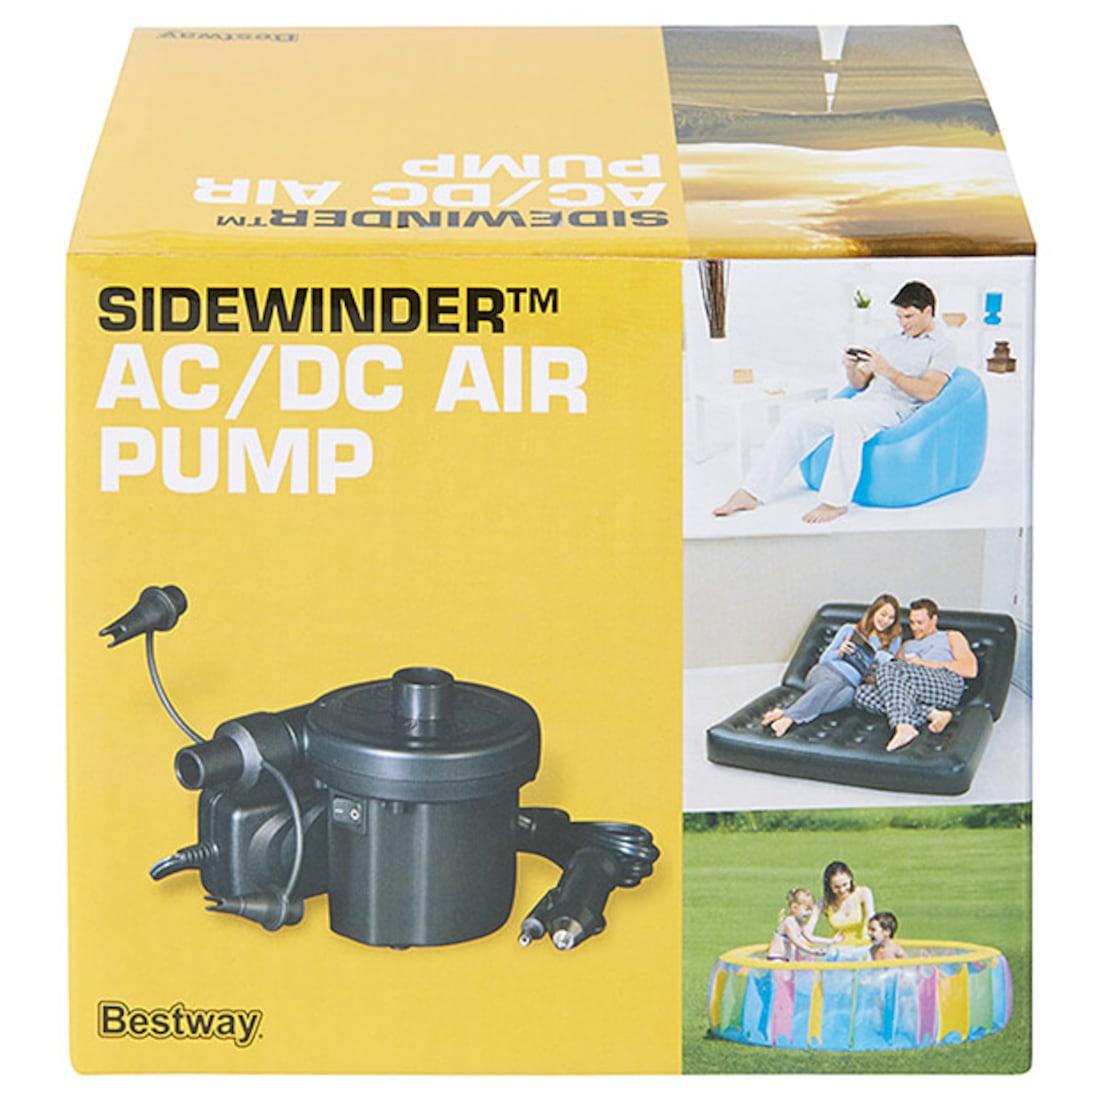 Zračna pumpa sidewinder 2 go bestway